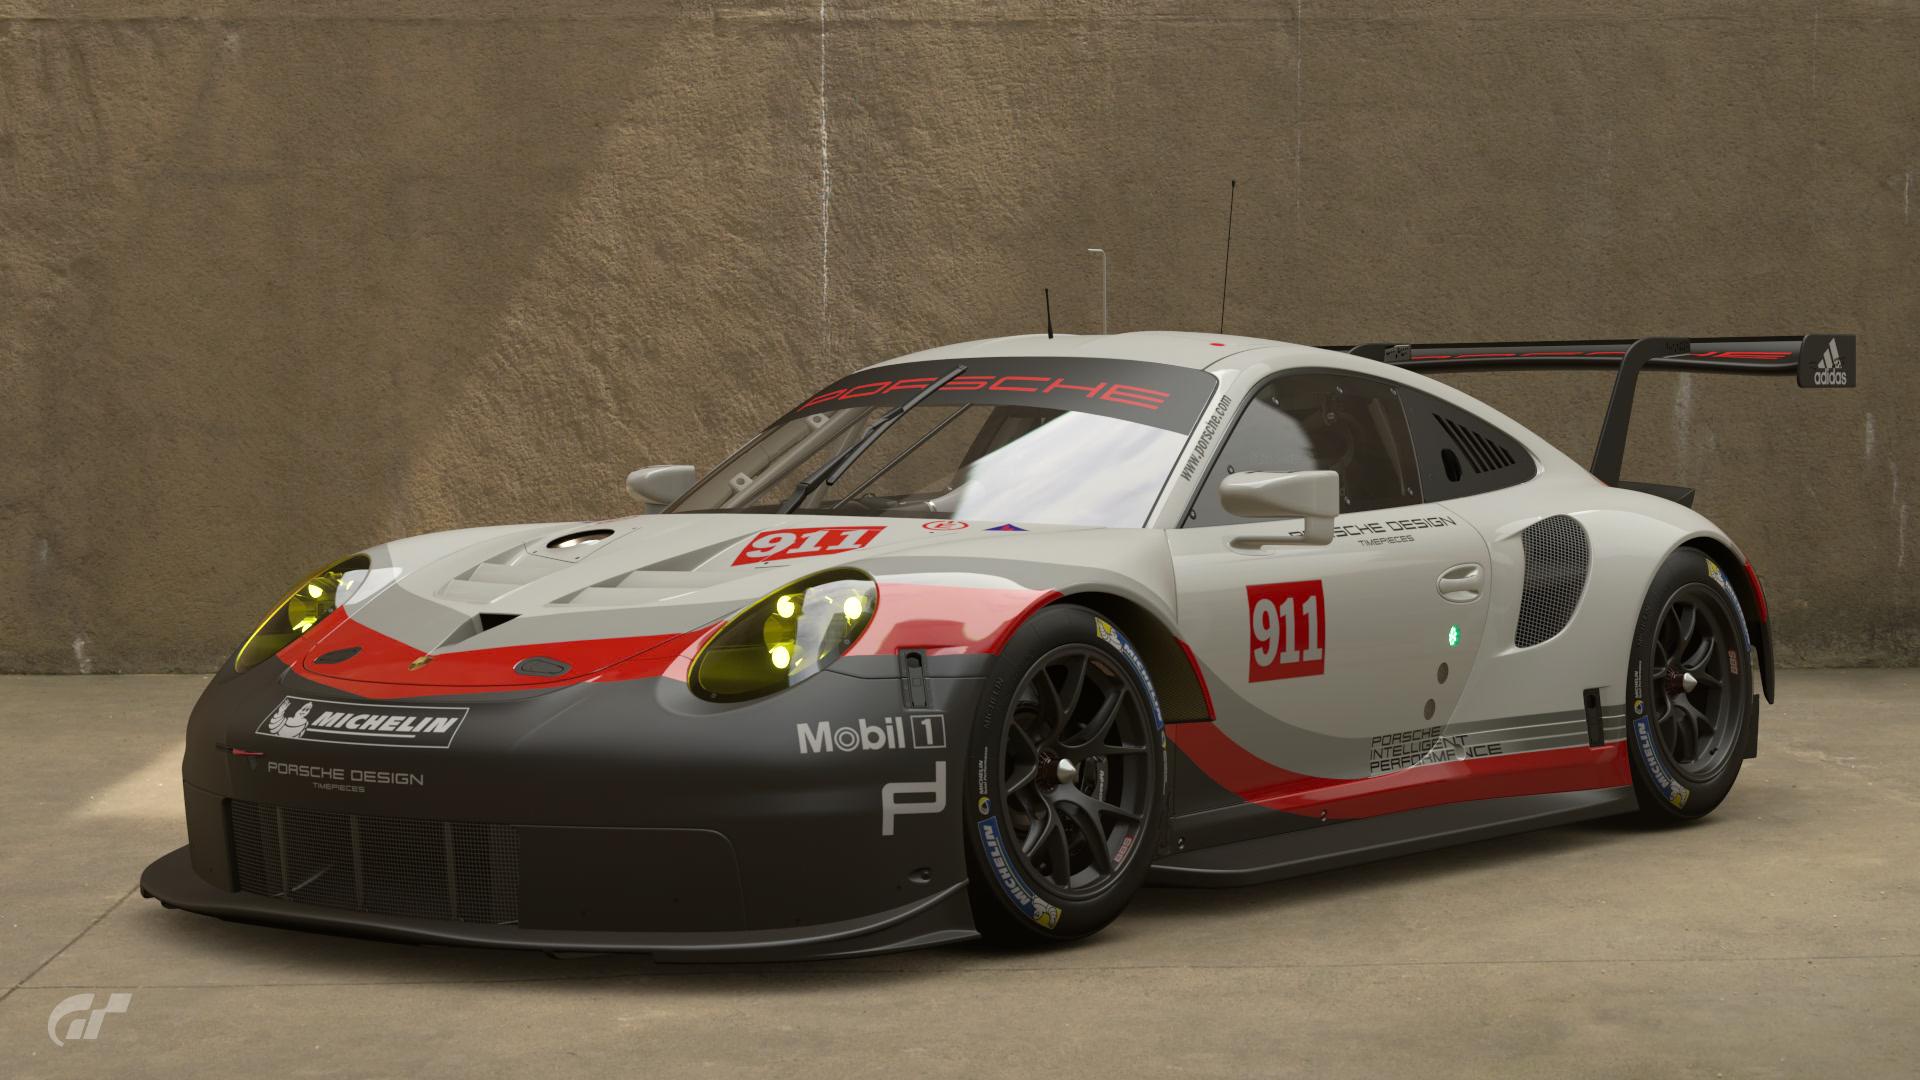 Porsche 911 RSR (991) '17 | Gran Turismo Wiki | FANDOM powered by Wikia